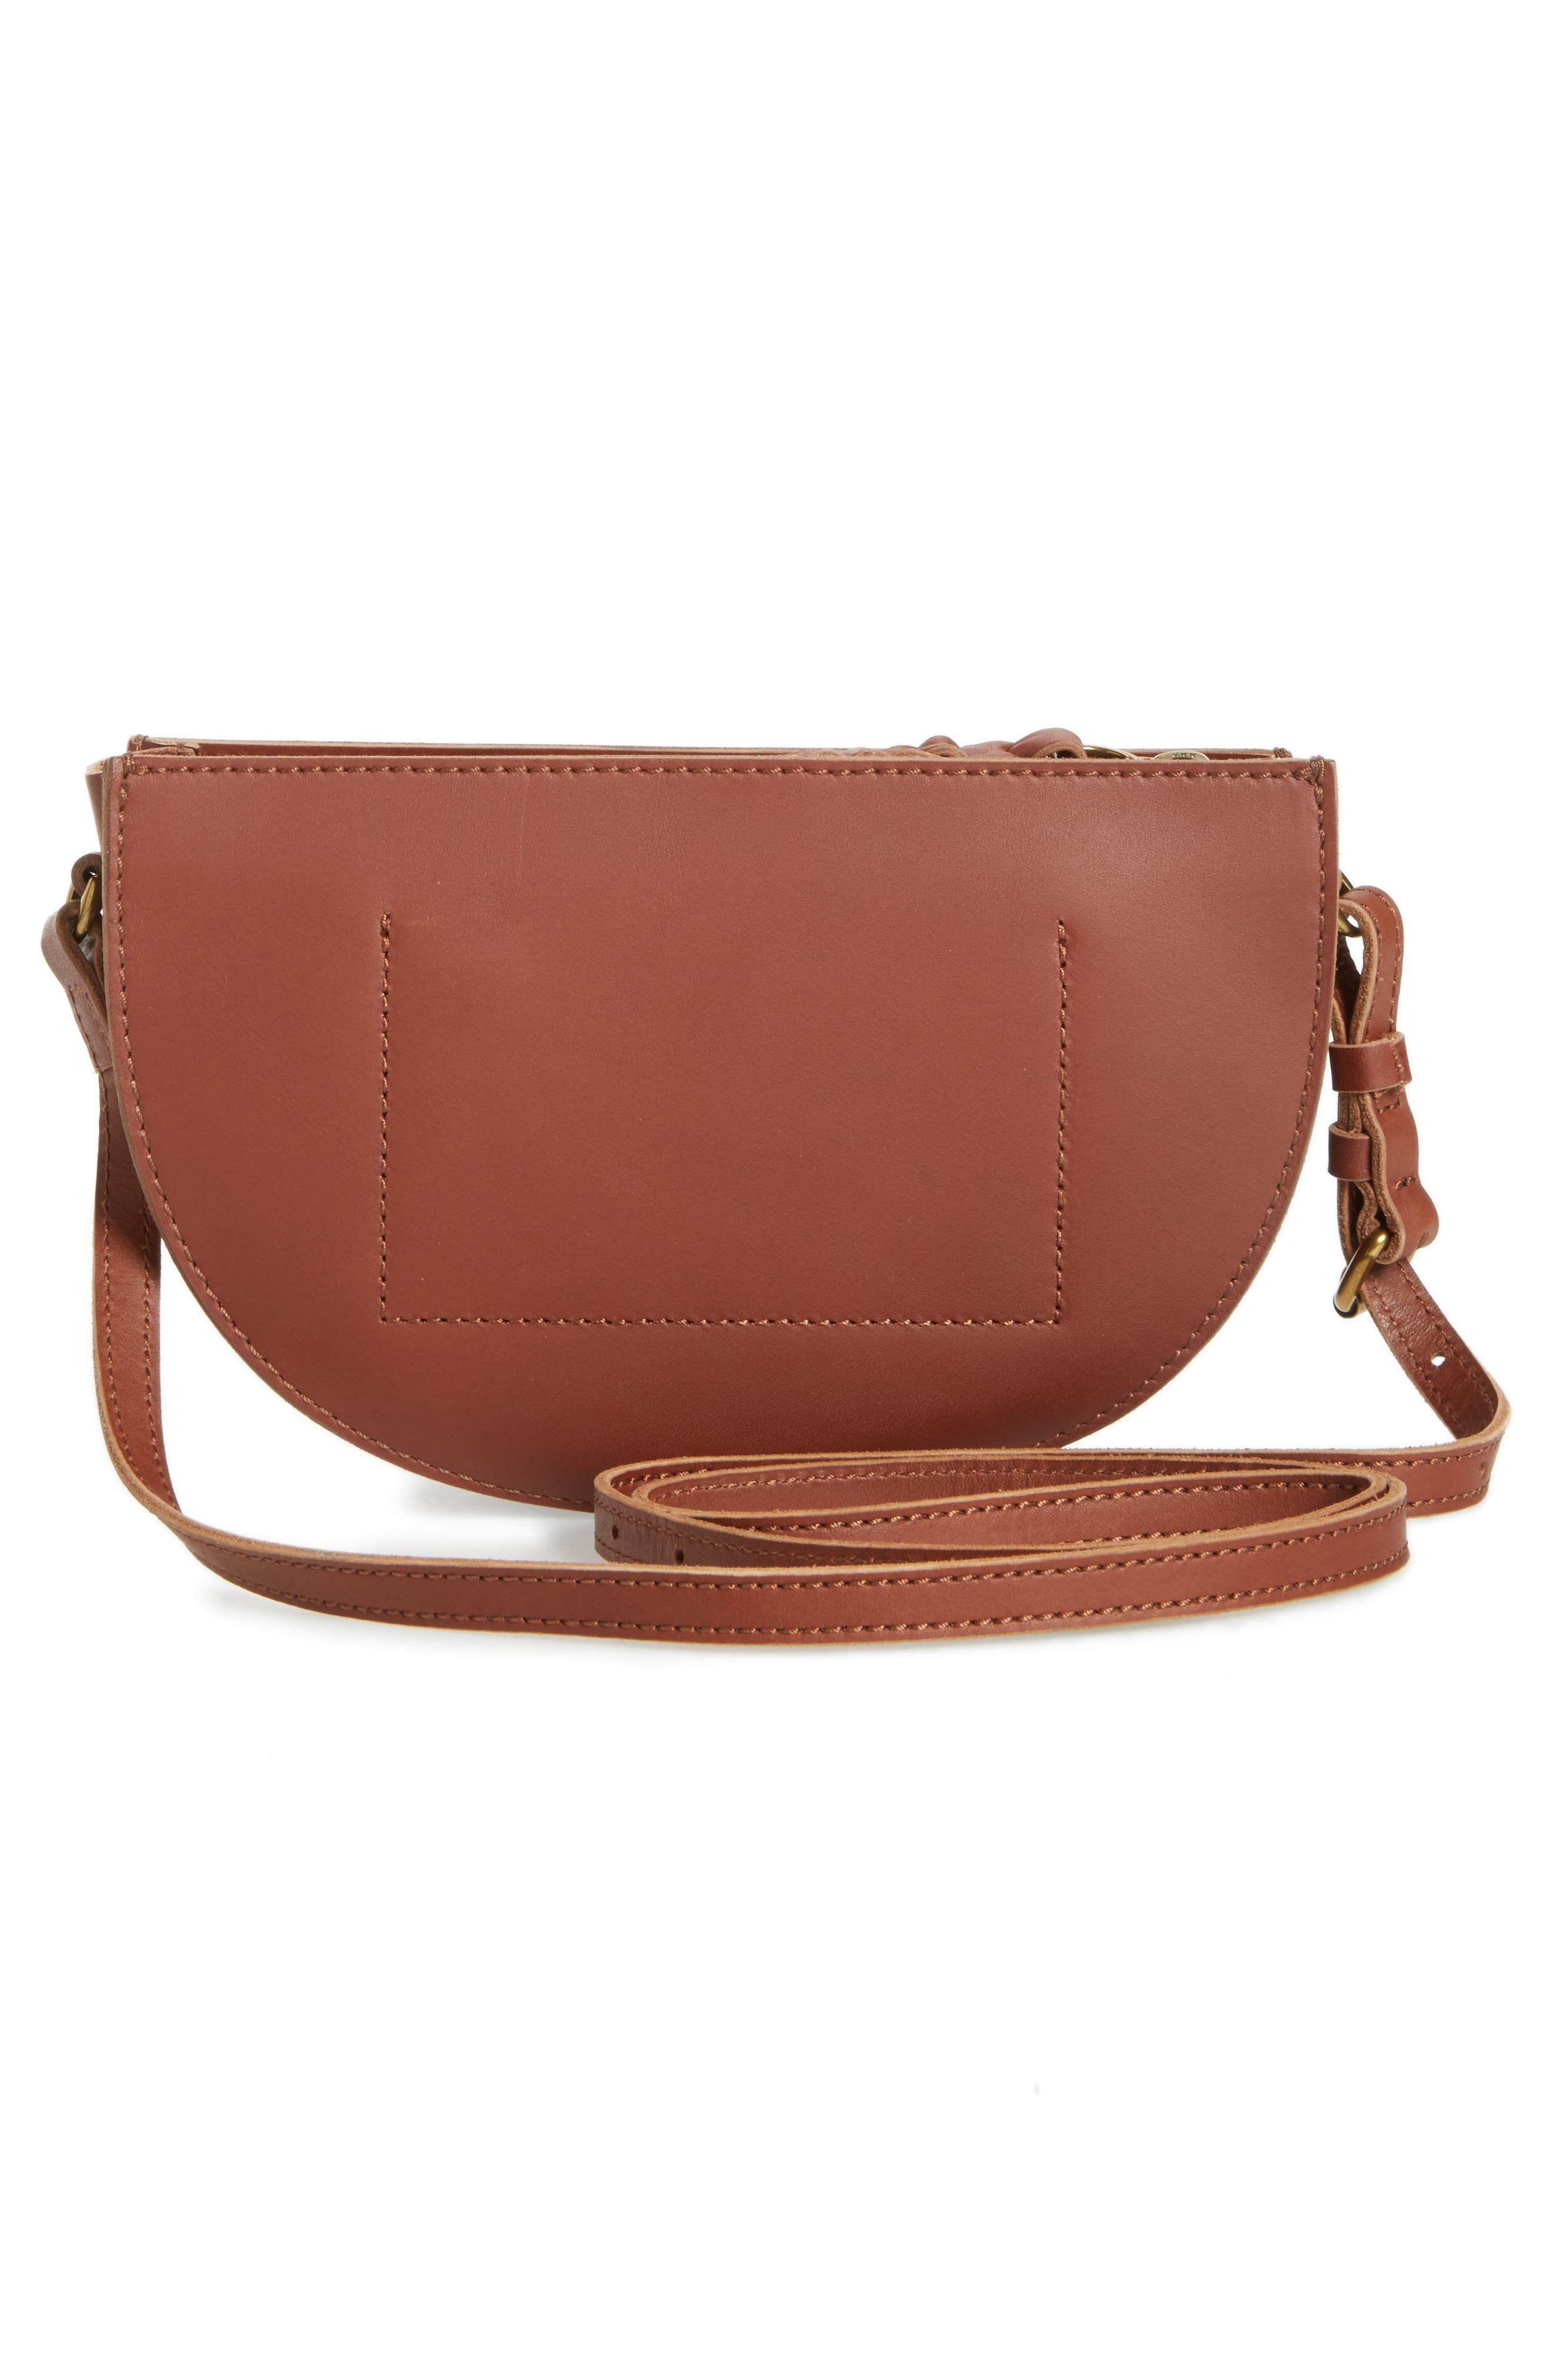 Juniper Vachetta Leather Half Moon Crossbody Bag,                             Alternate thumbnail 9, color,